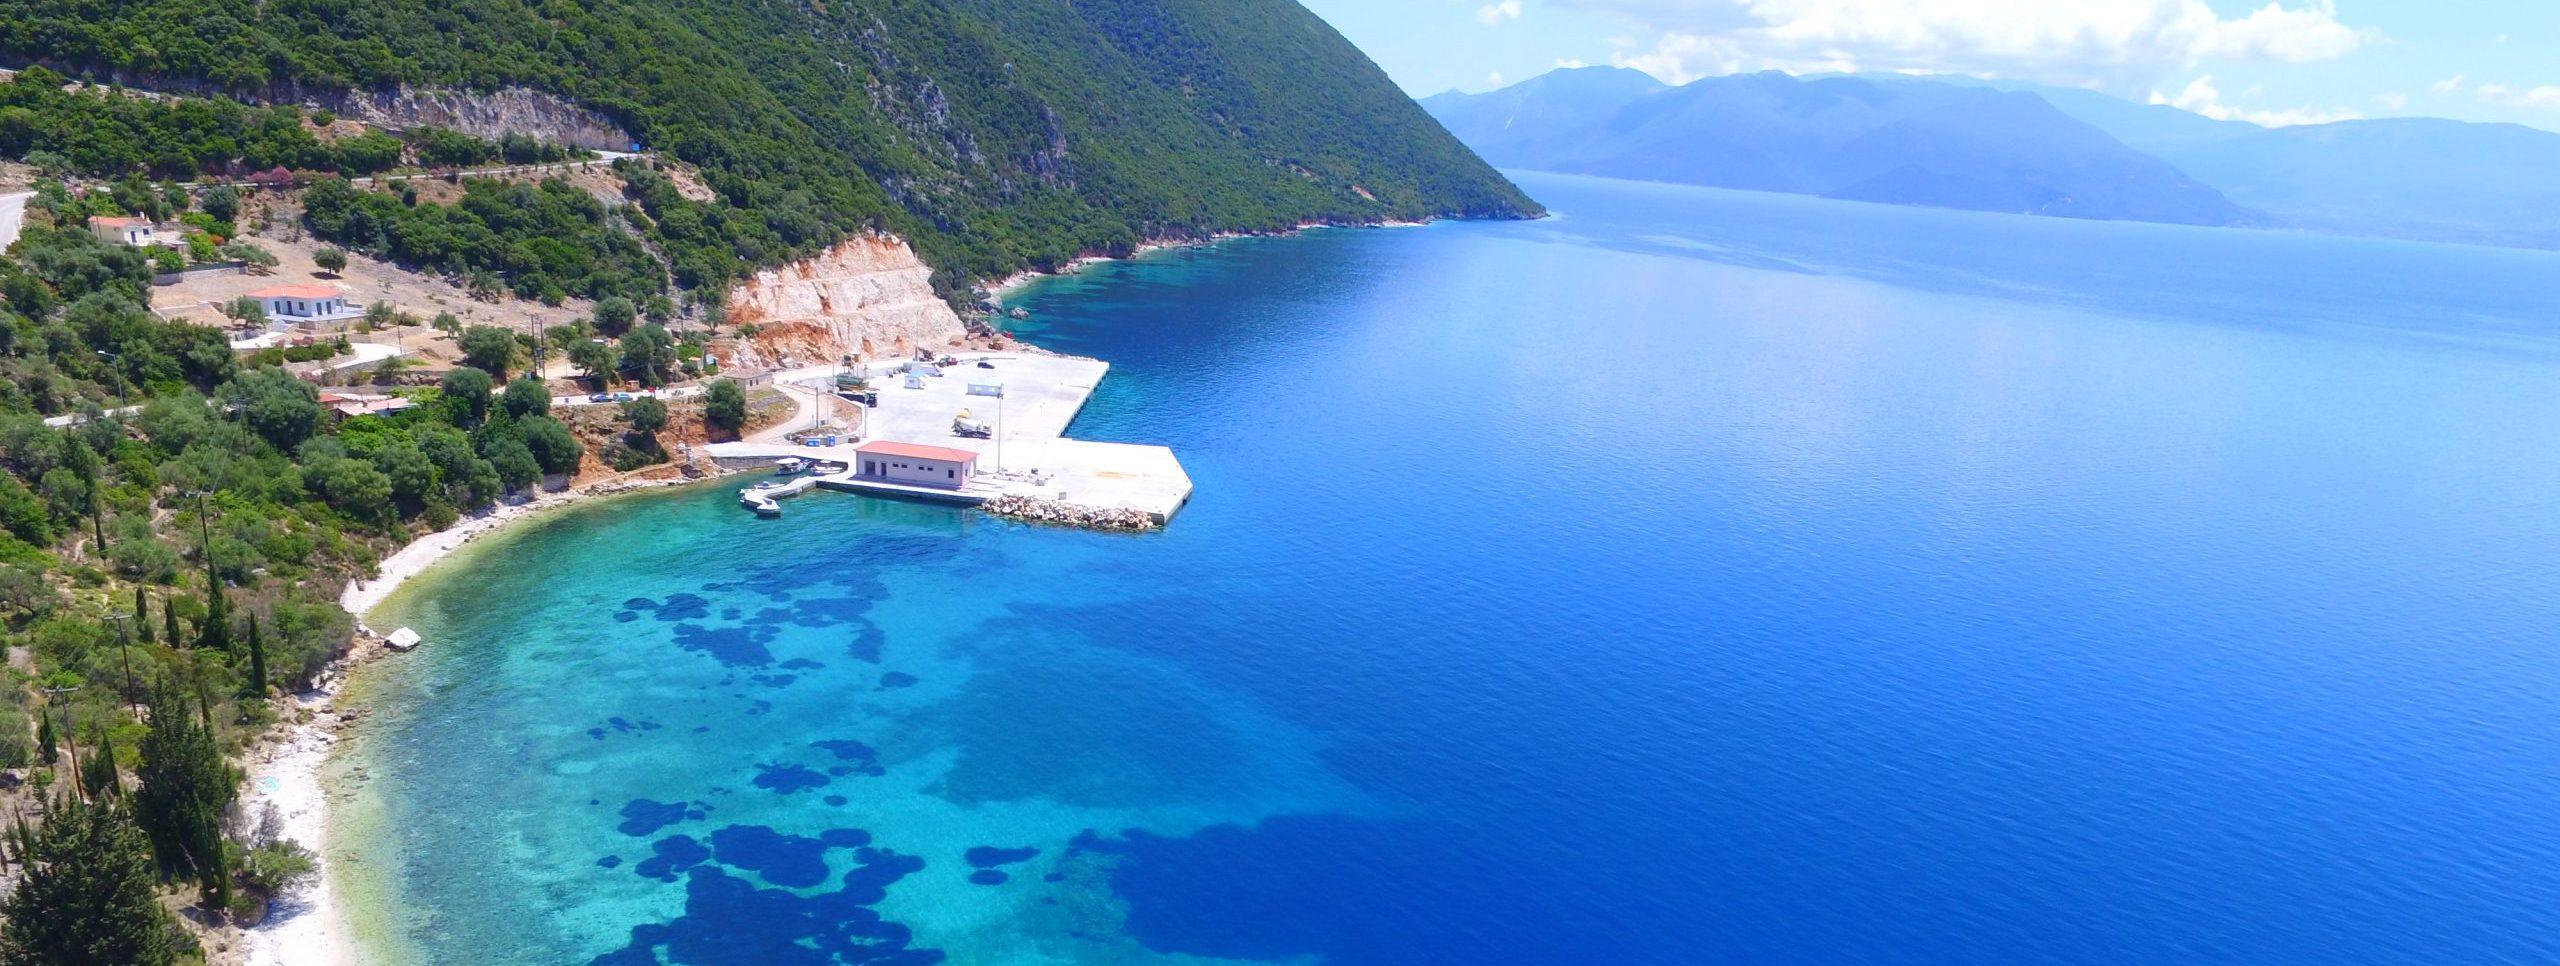 MV Properties, Ithaca Greece real estate, Piso Aetos port